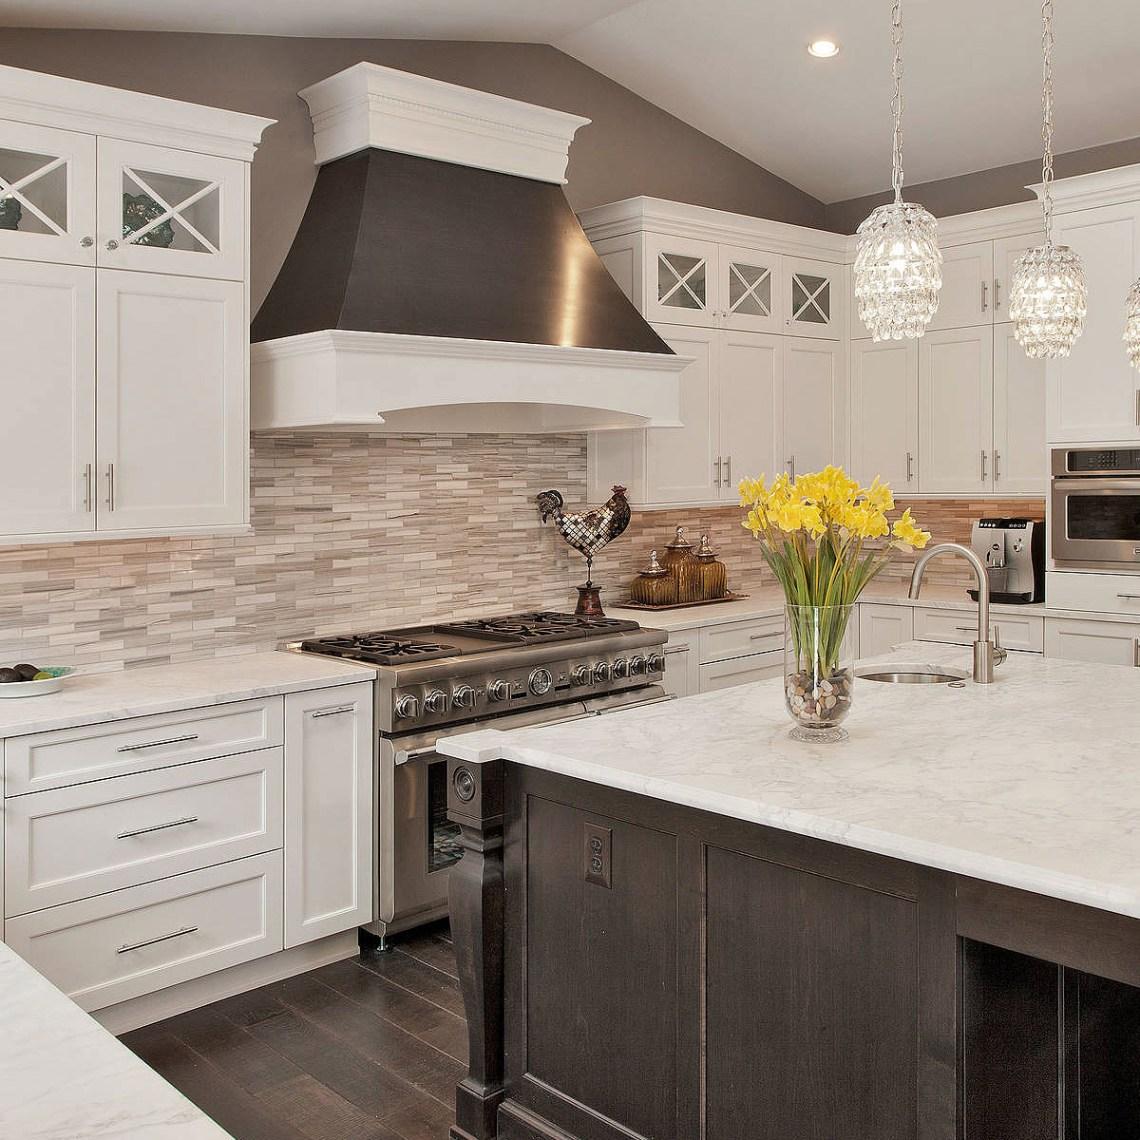 Backsplash Best Kitchen Backsplash Ideas Top Trends